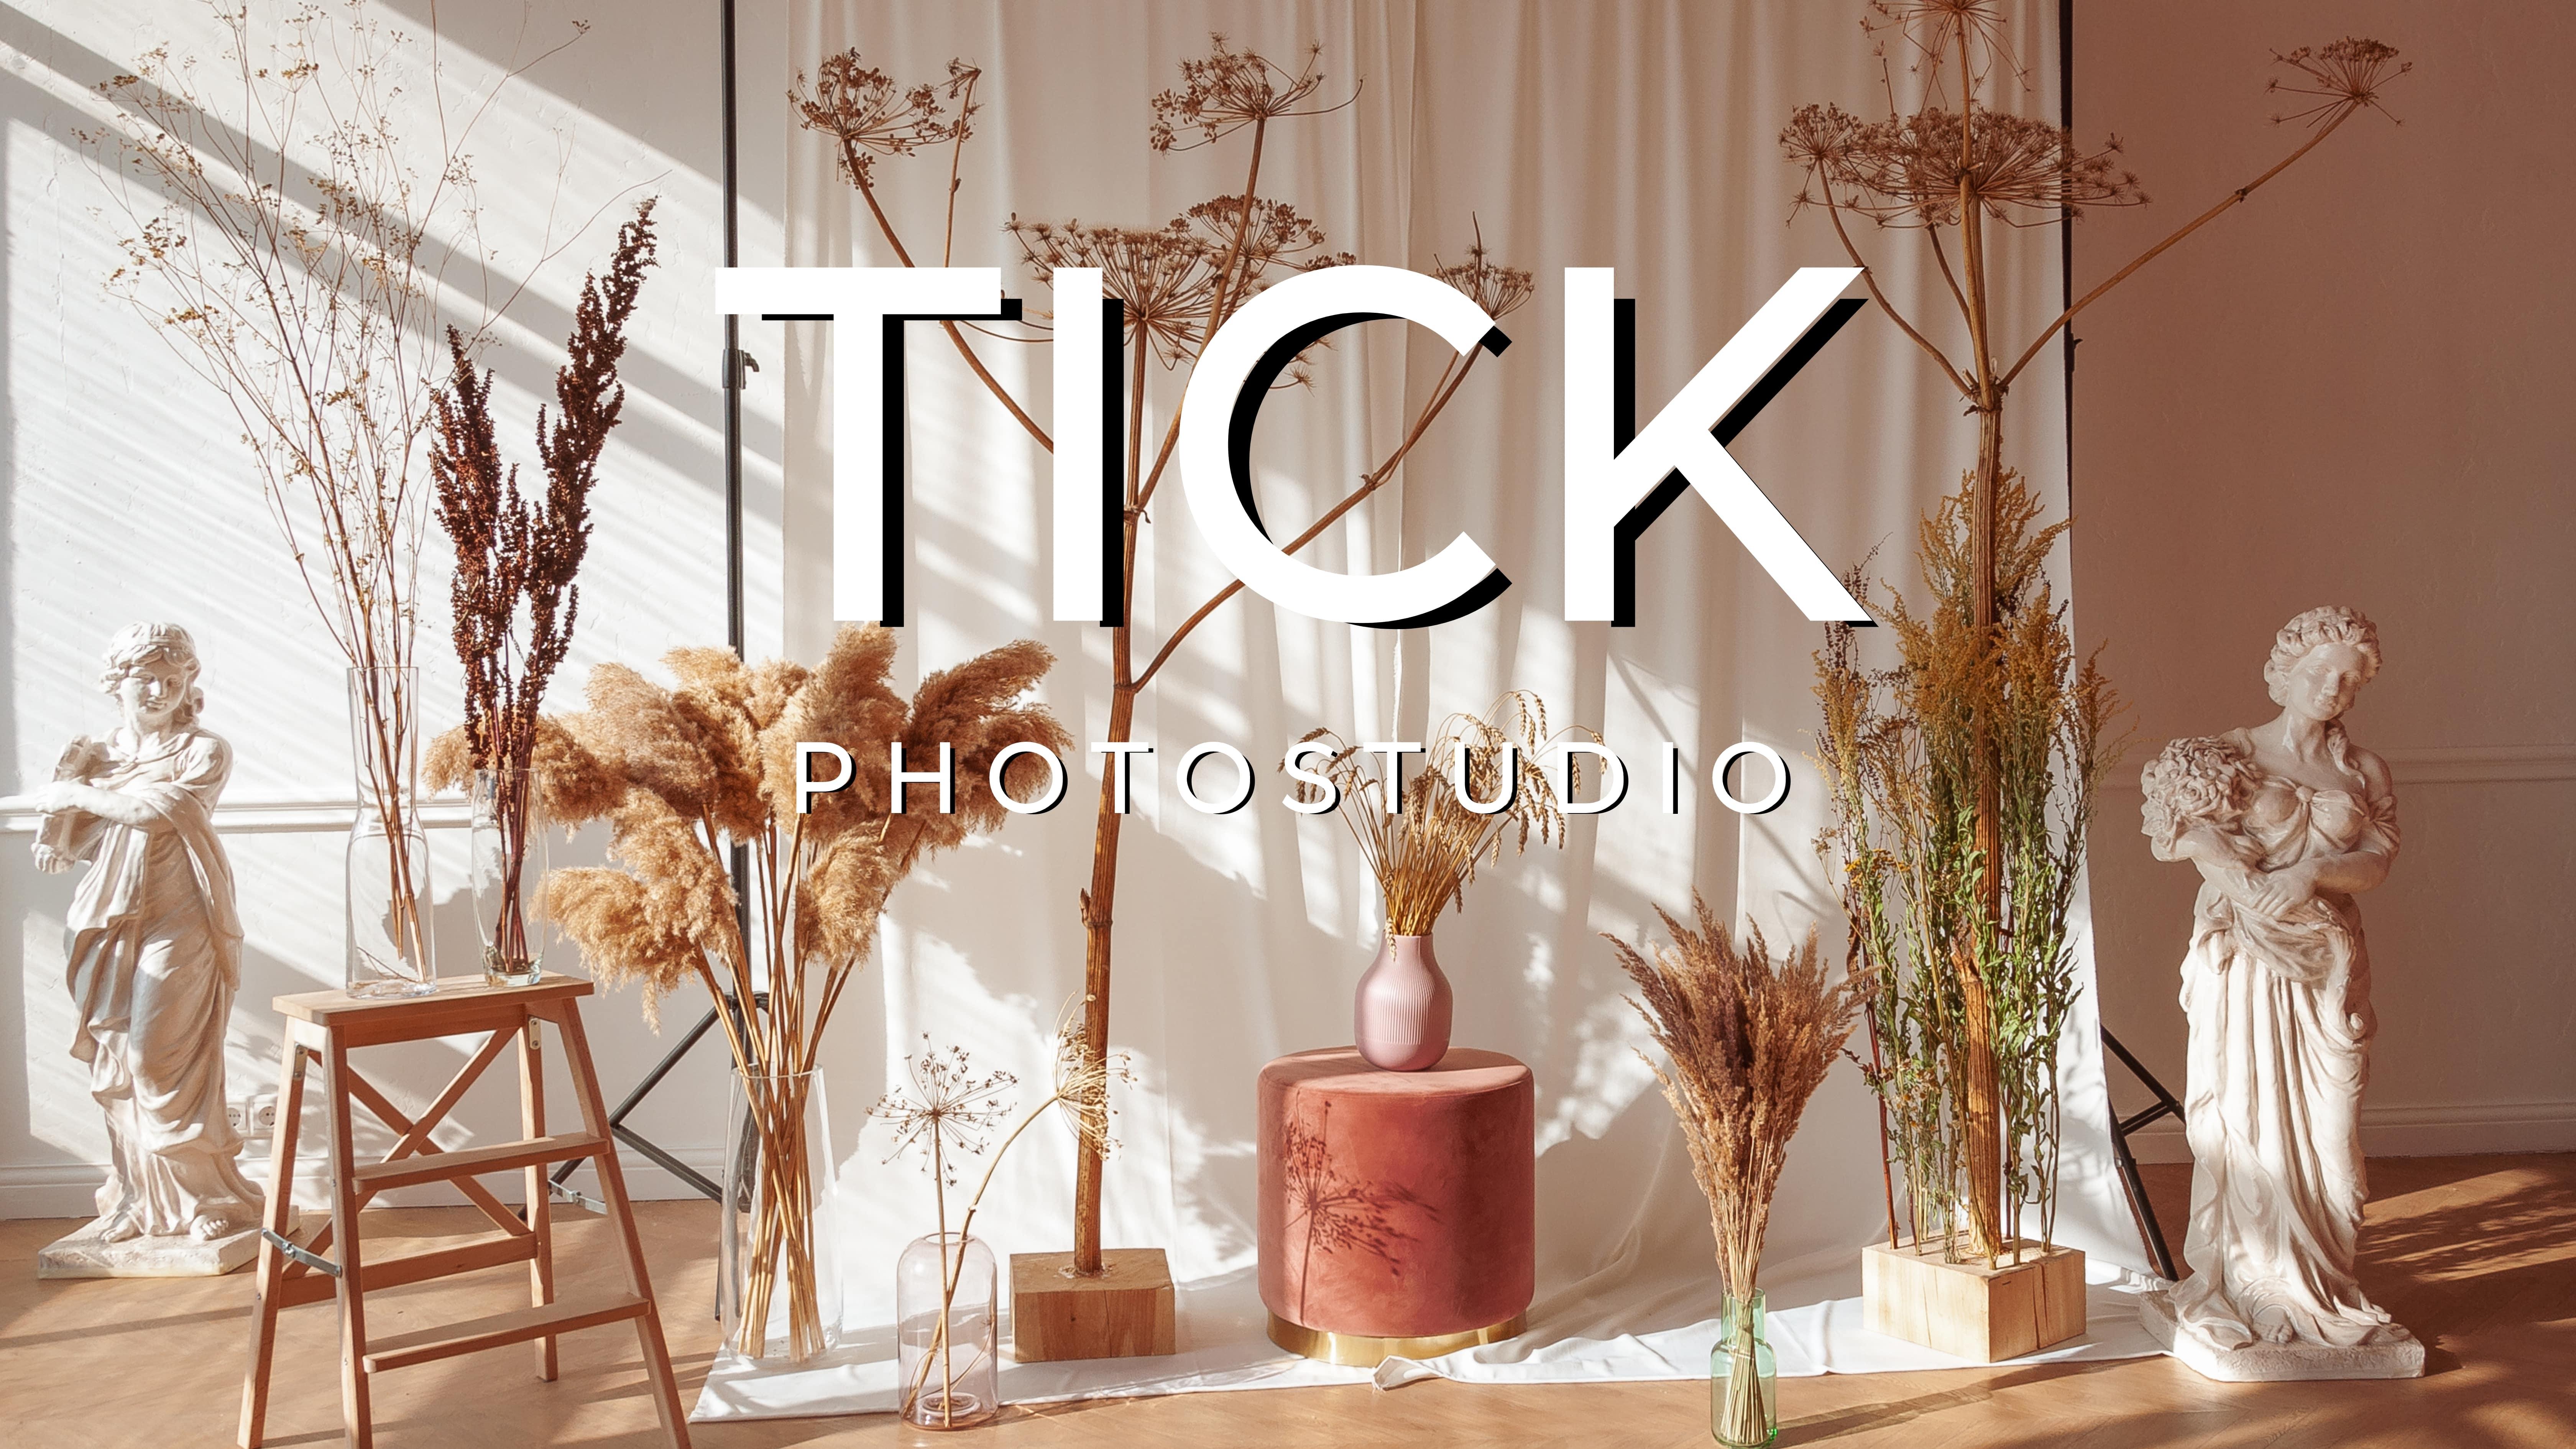 Tick Studio